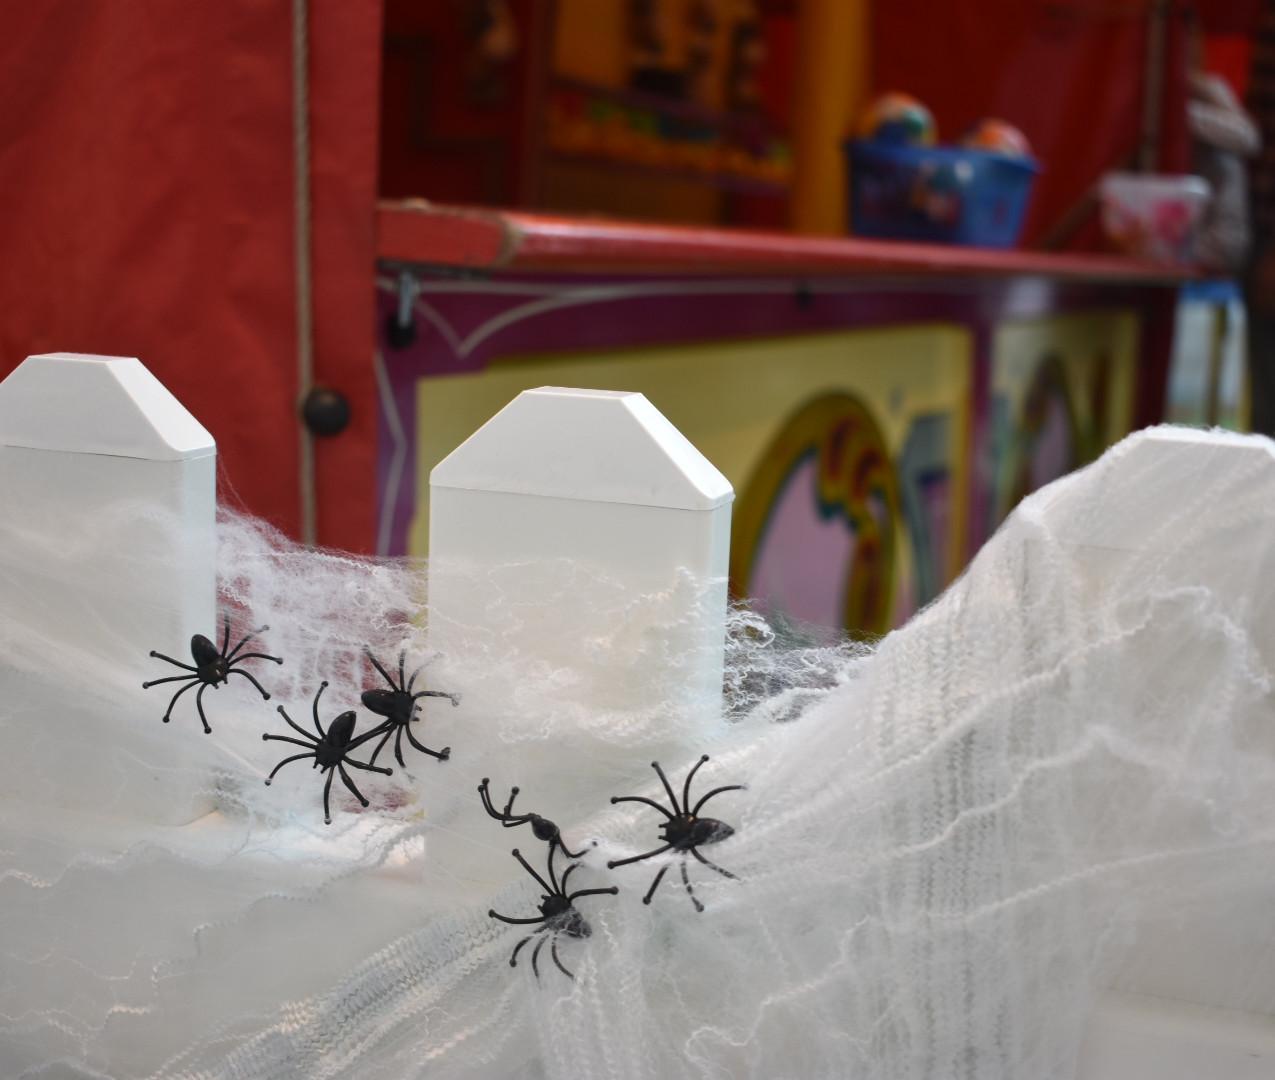 HalloweenFunfair